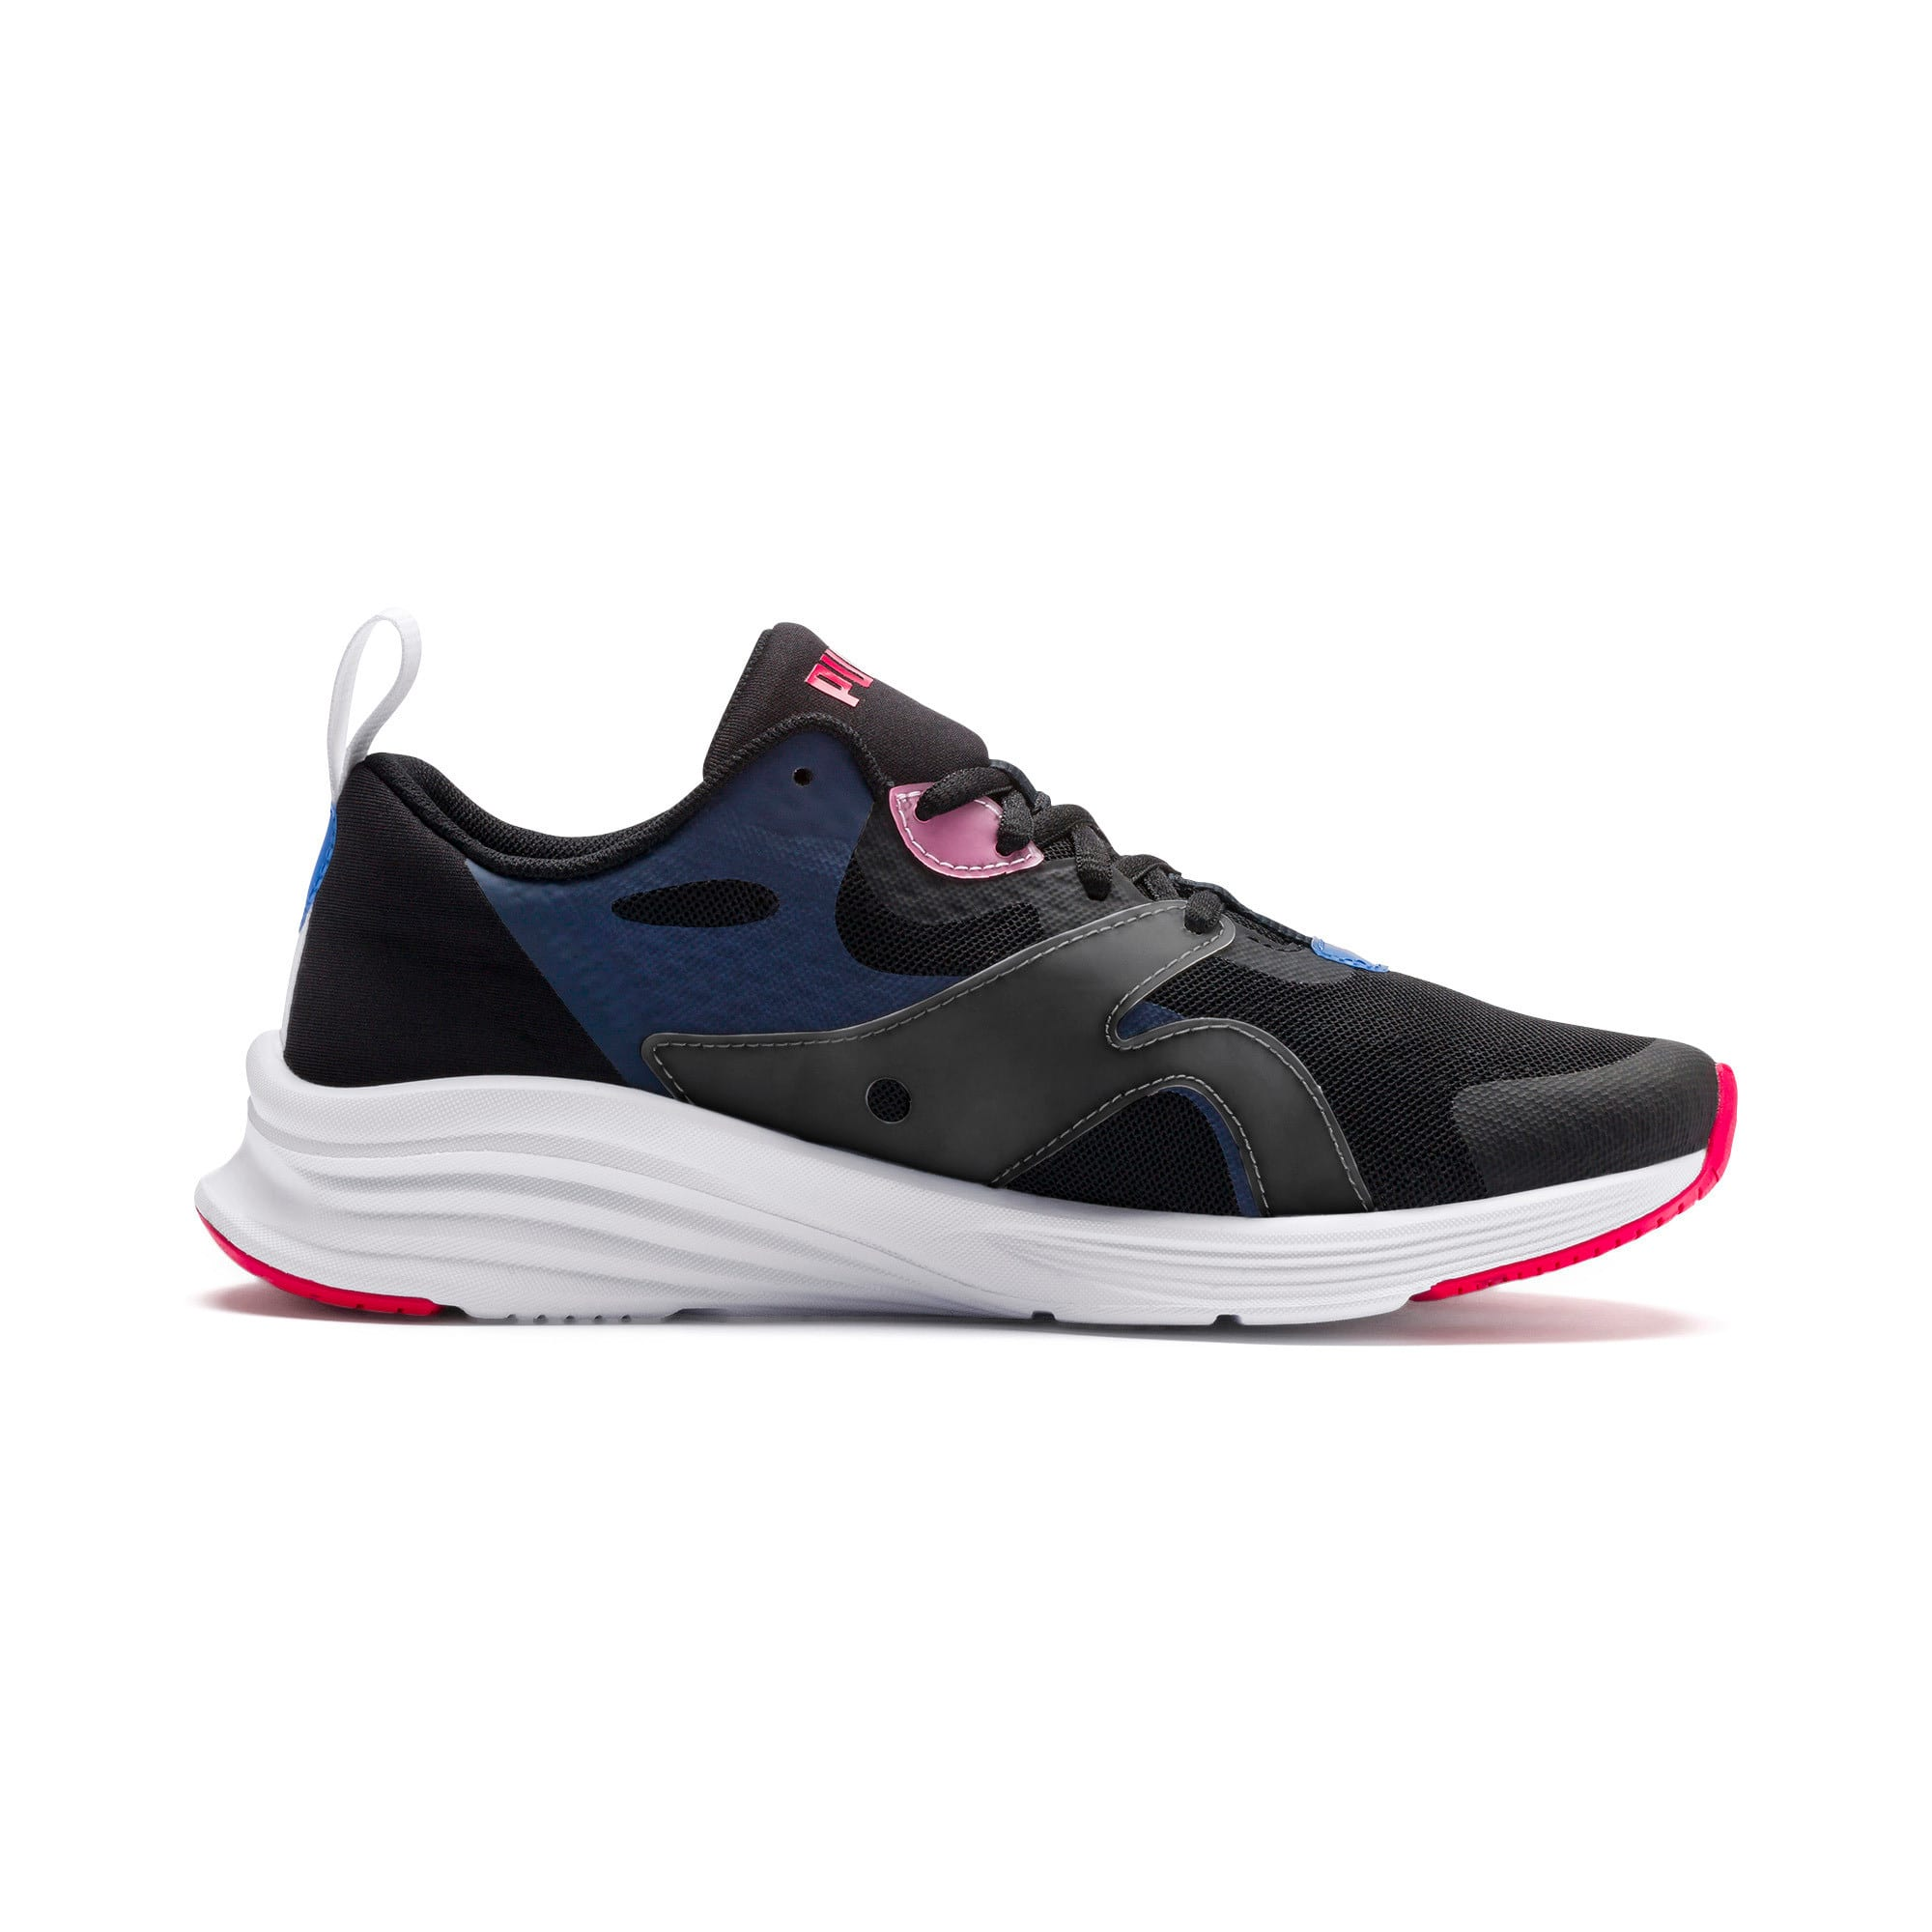 Thumbnail 6 of HYBRID Fuego Women's Running Shoes, Black-Blue Glimmer-Nrgy Rose, medium